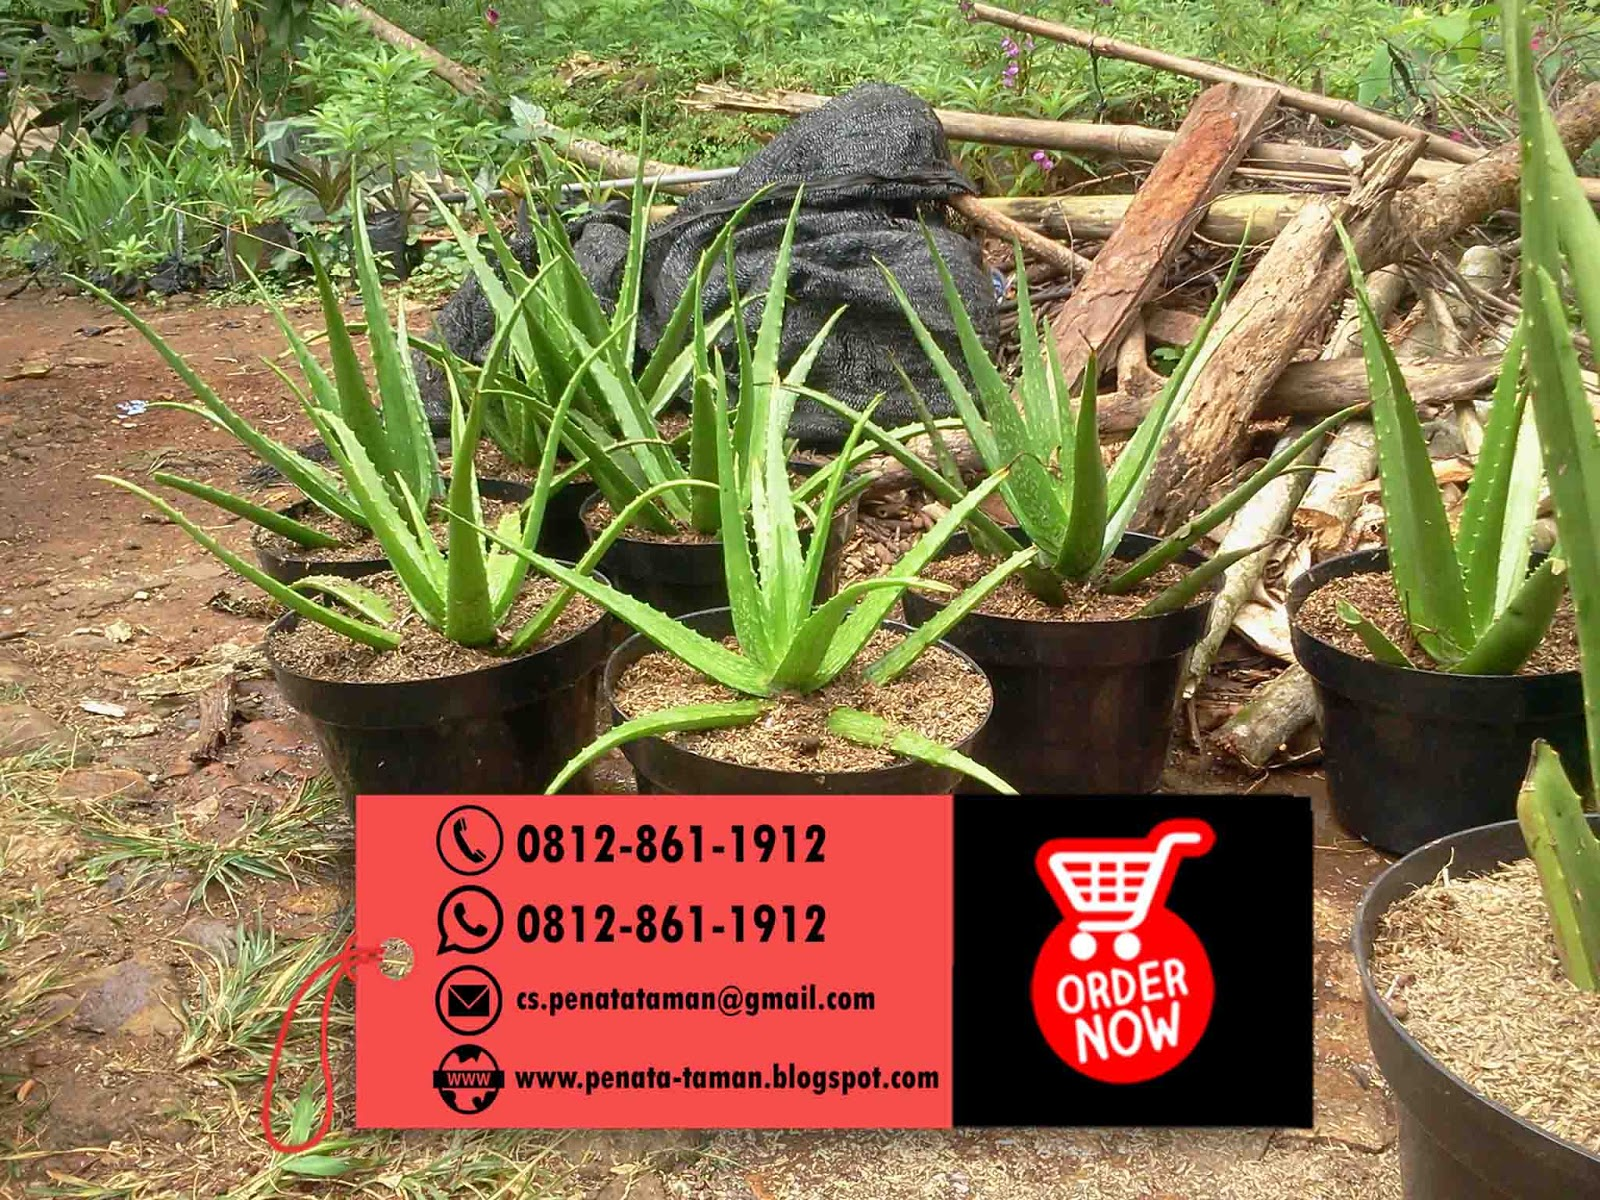 Pohon Lidah Buaya Aloe Vera Untuk Info Harga Dan Pemesanan Silahkan Hubungi